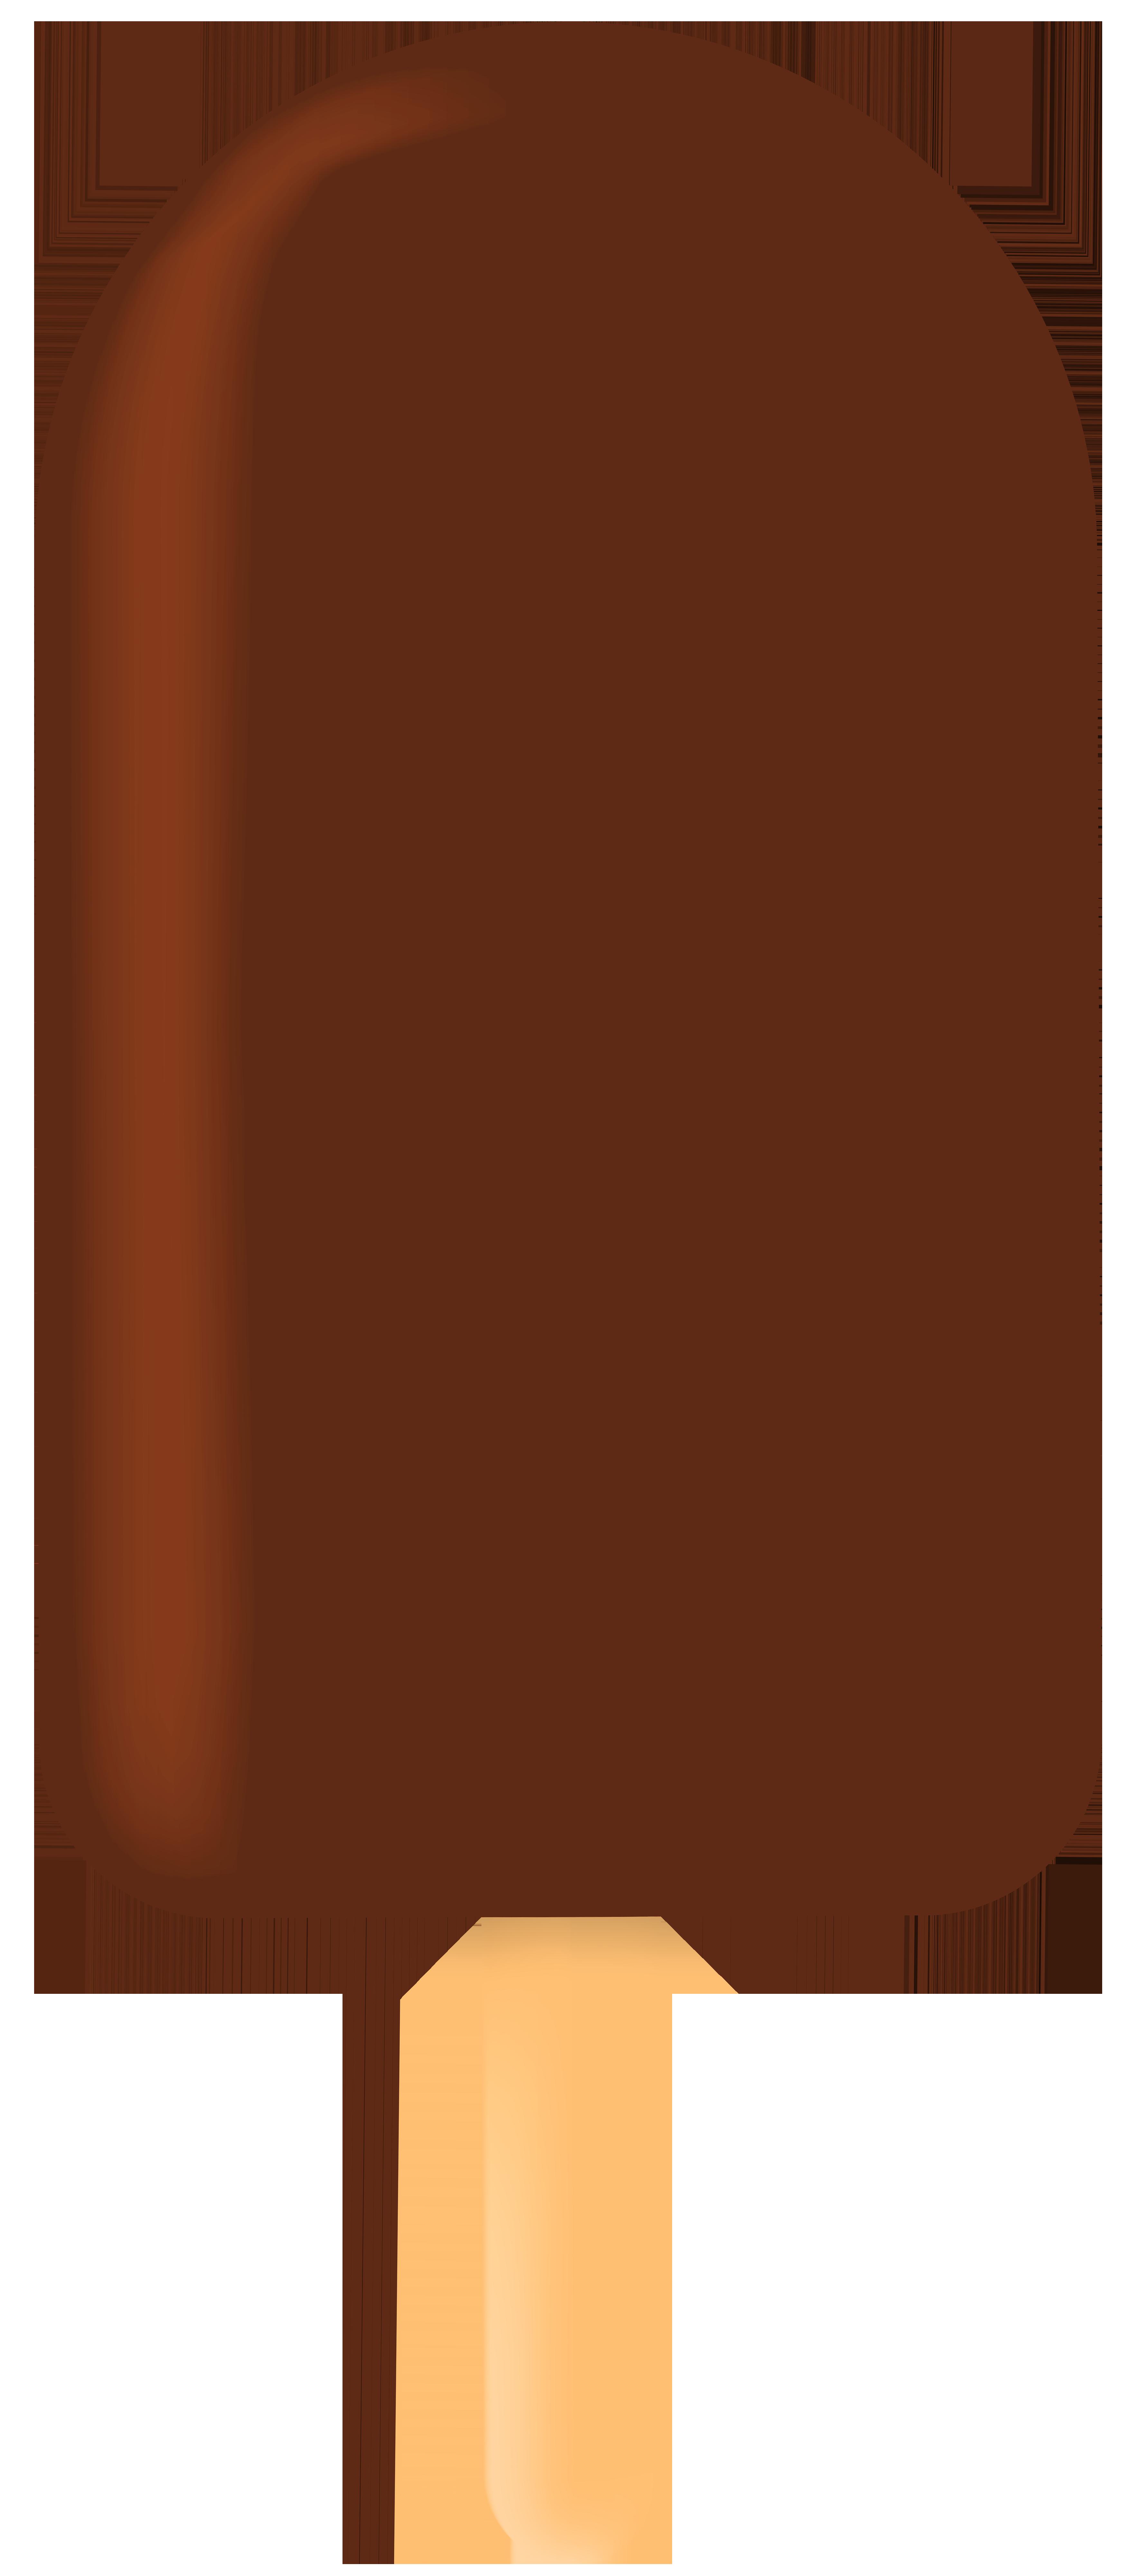 Bar clipart transparent. Chocolate ice cream png